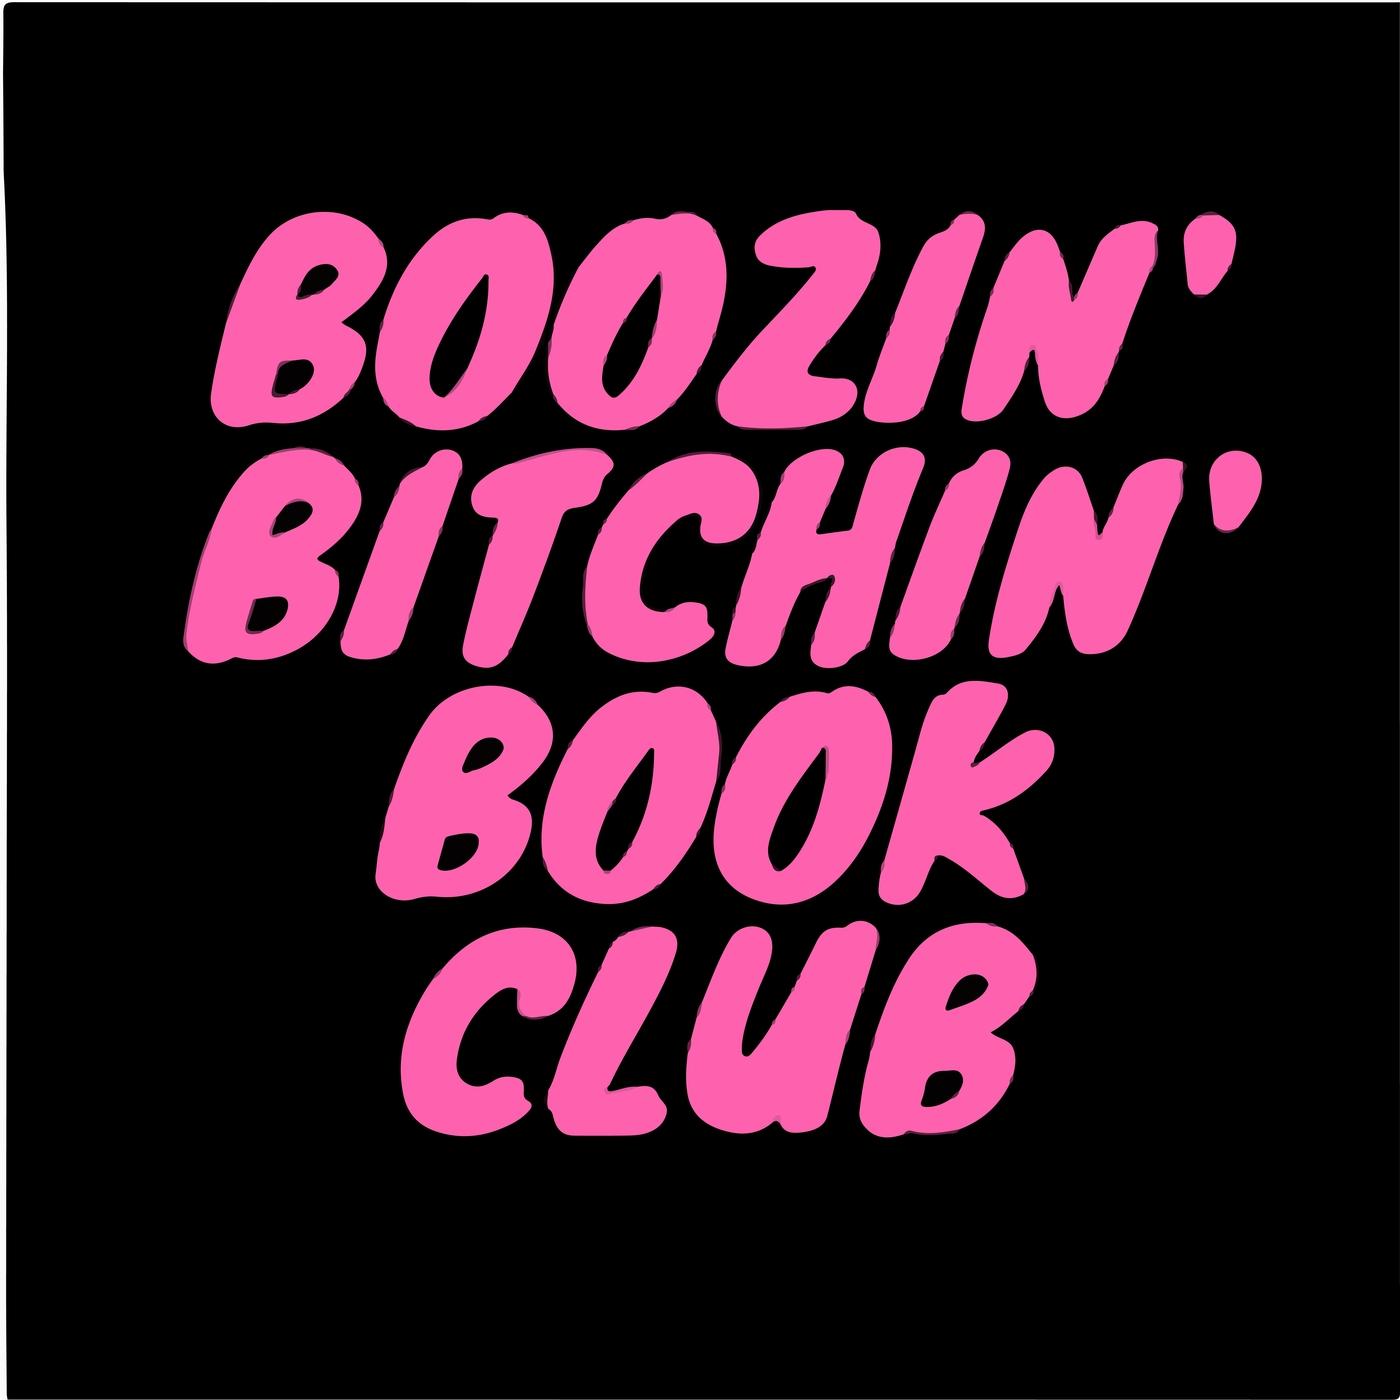 Boozin' Bitchin' Book Club show art